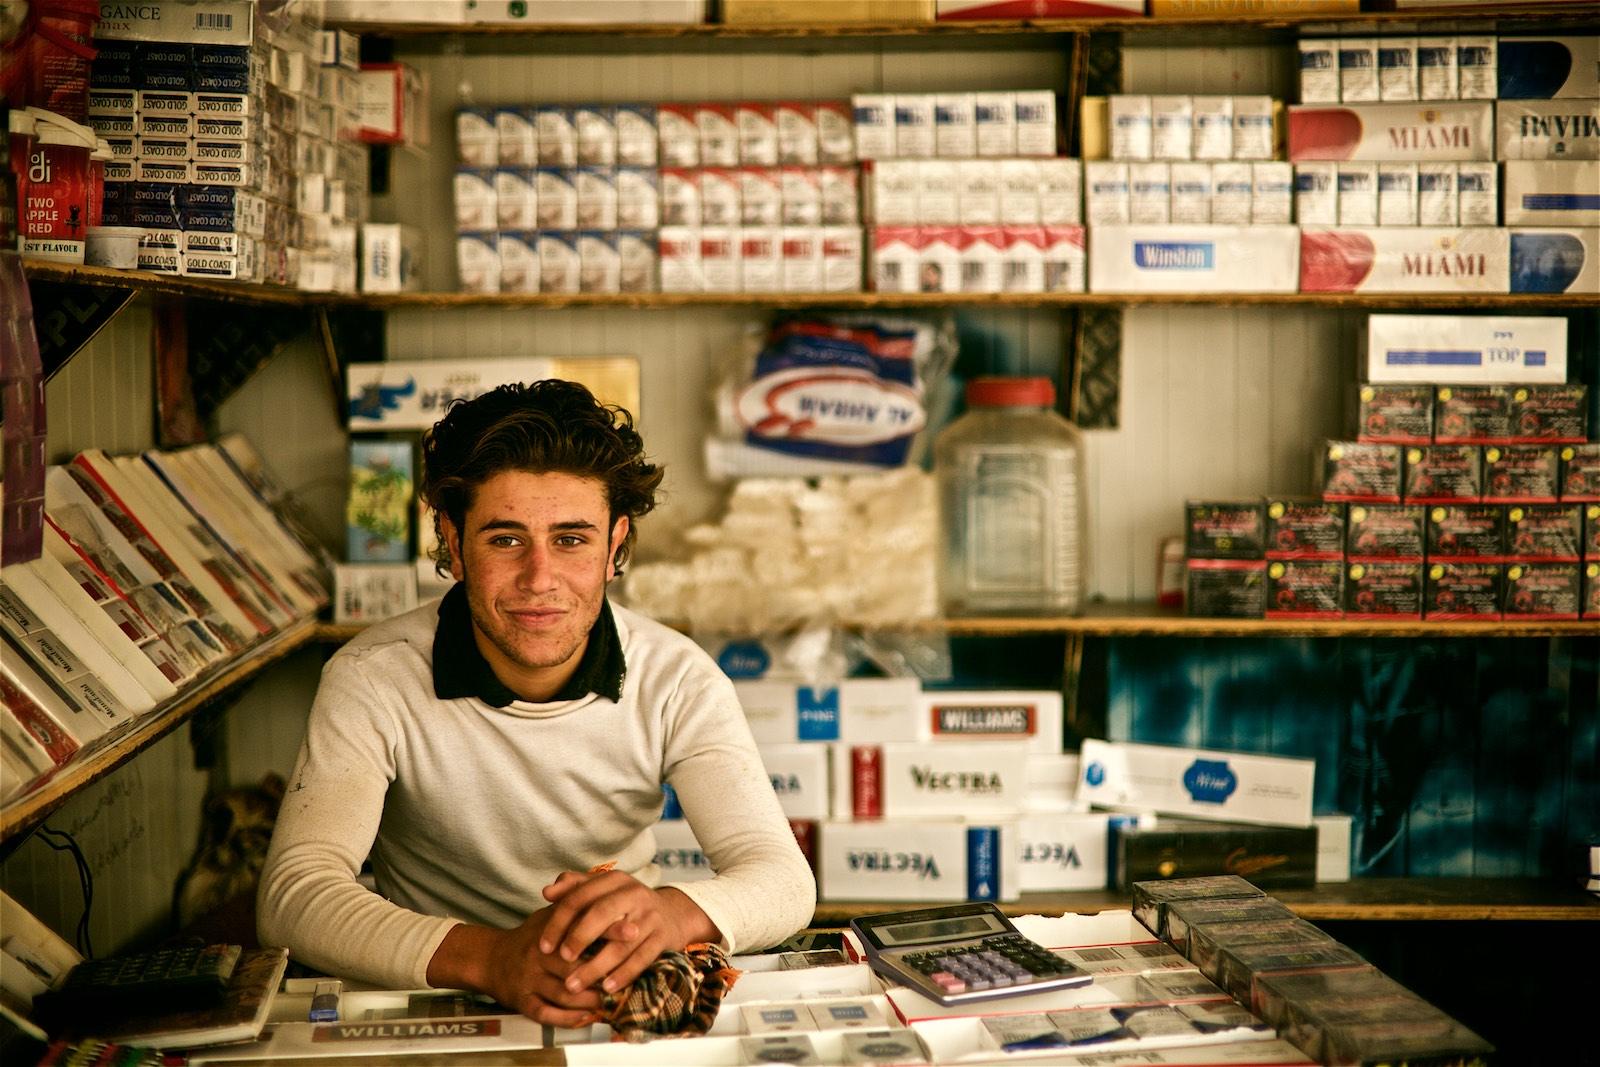 denis-bosnic-zaatari-jordan-refugee-camp-32.jpg